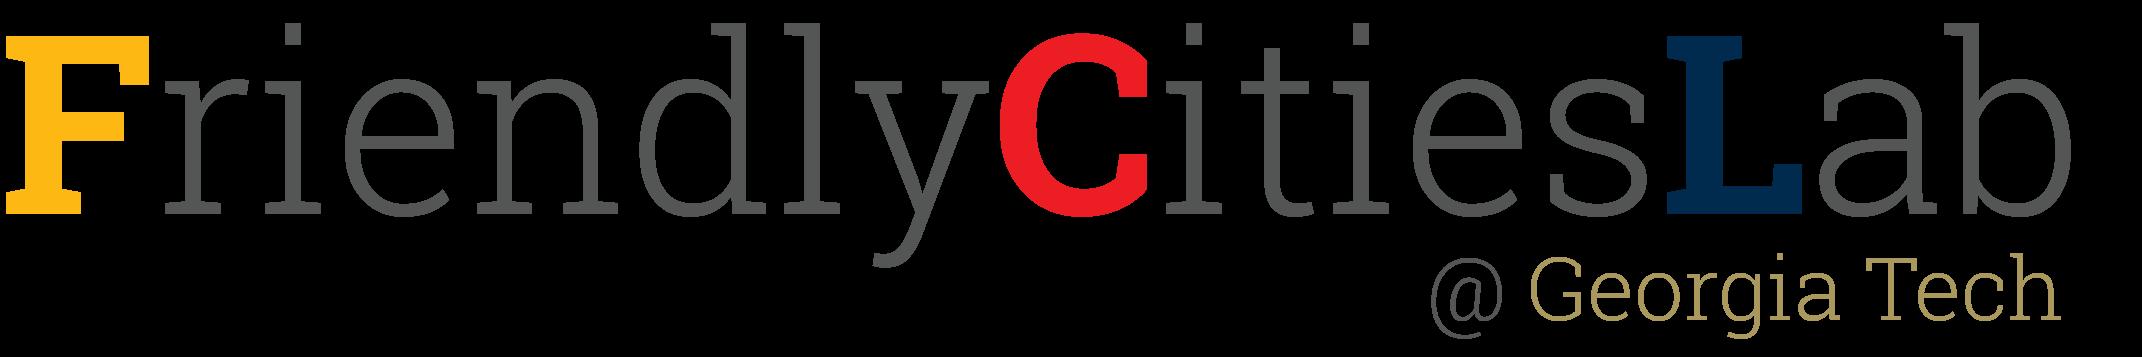 Friendly Cities Lab Logo